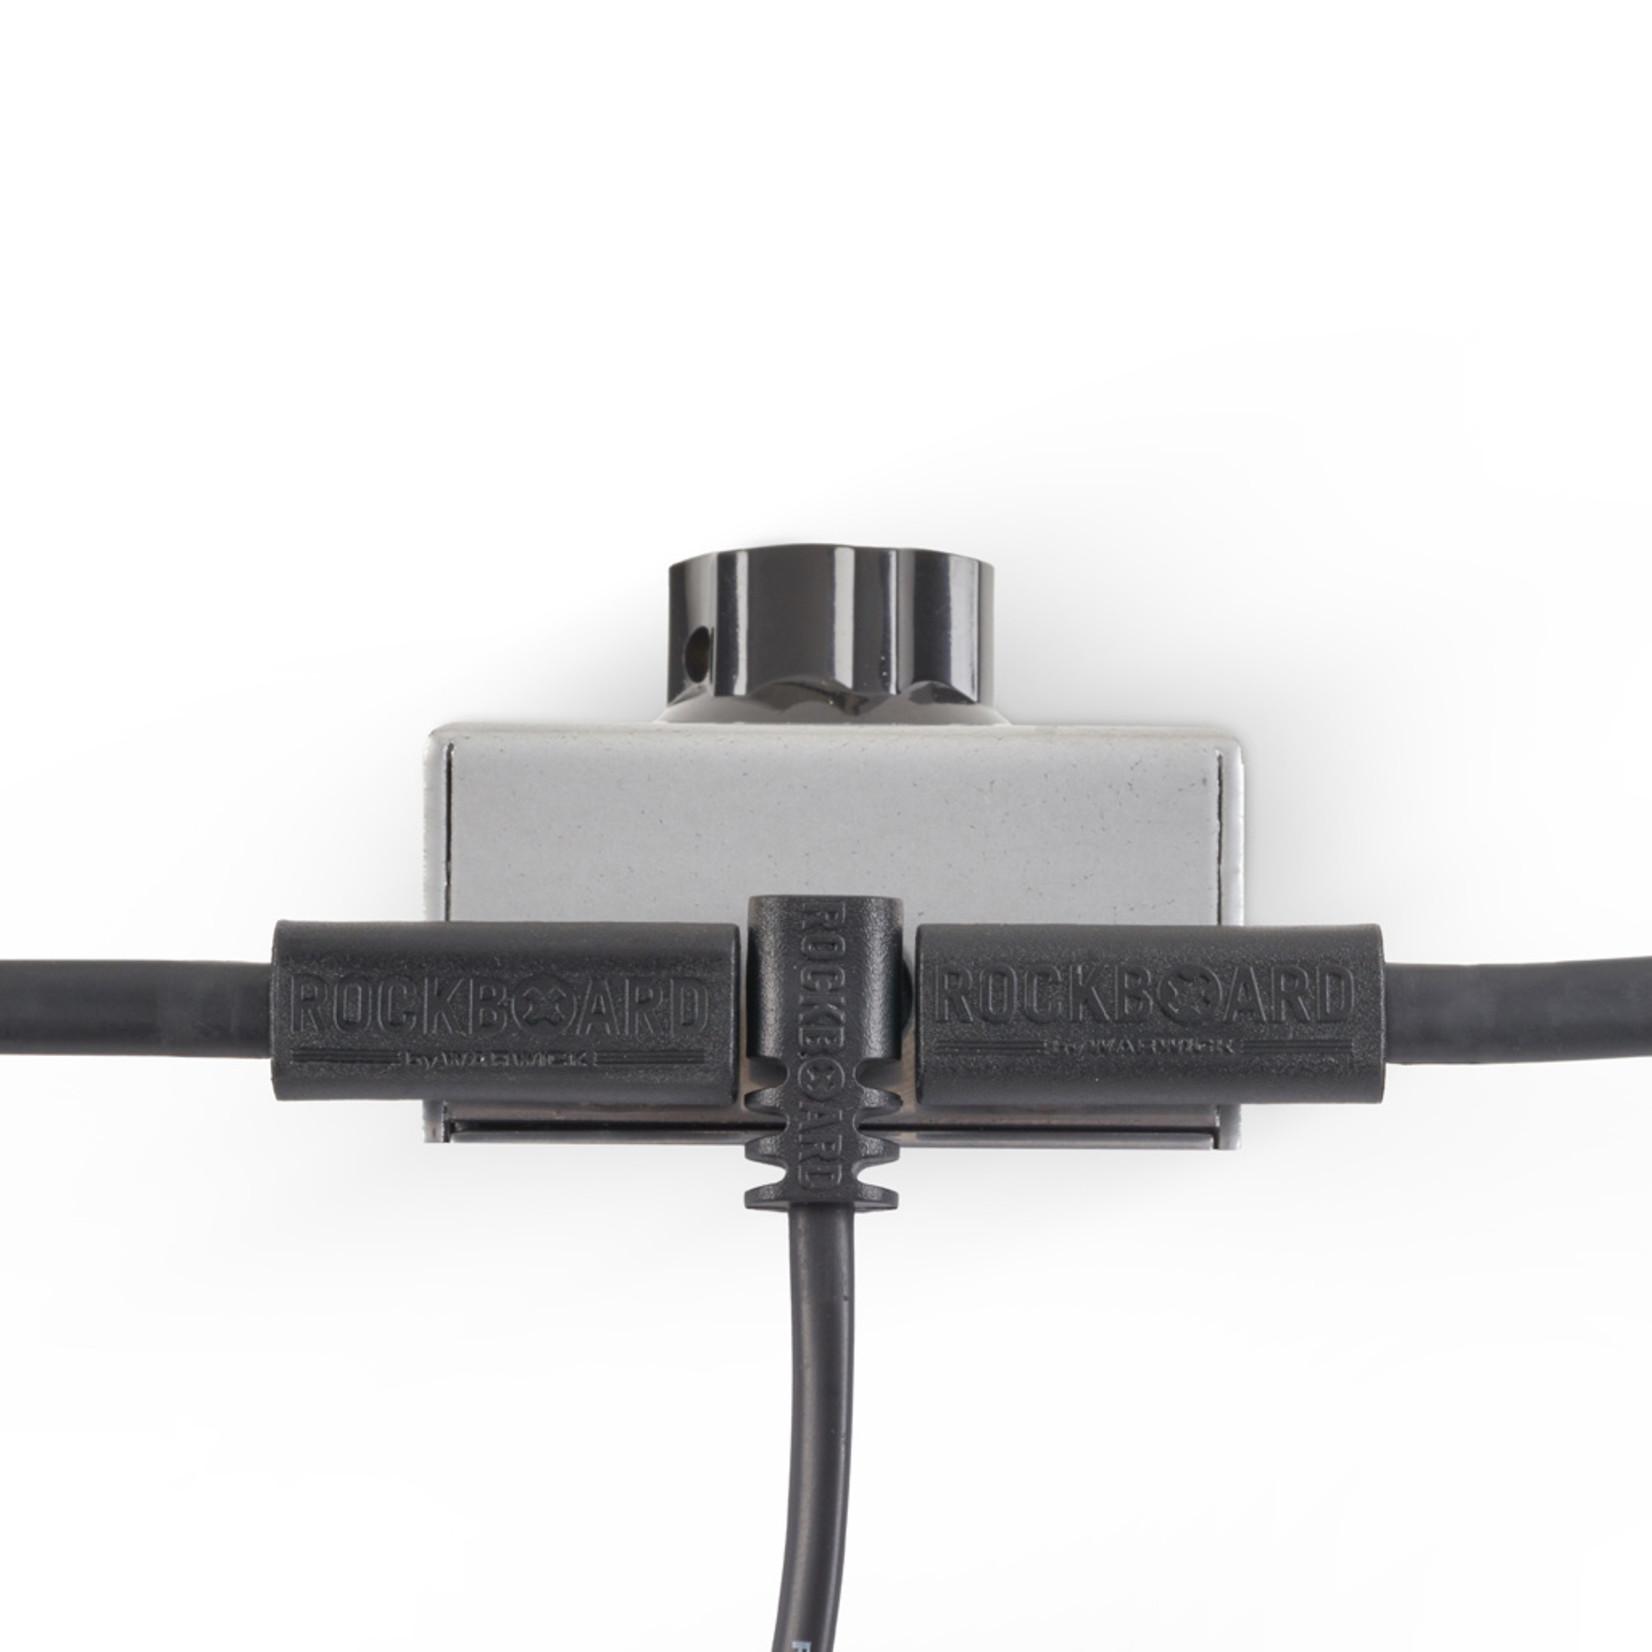 "Rockboard RockBoard Flat Power Cable - Angled/Straight - 60 cm / 23 5/8"""